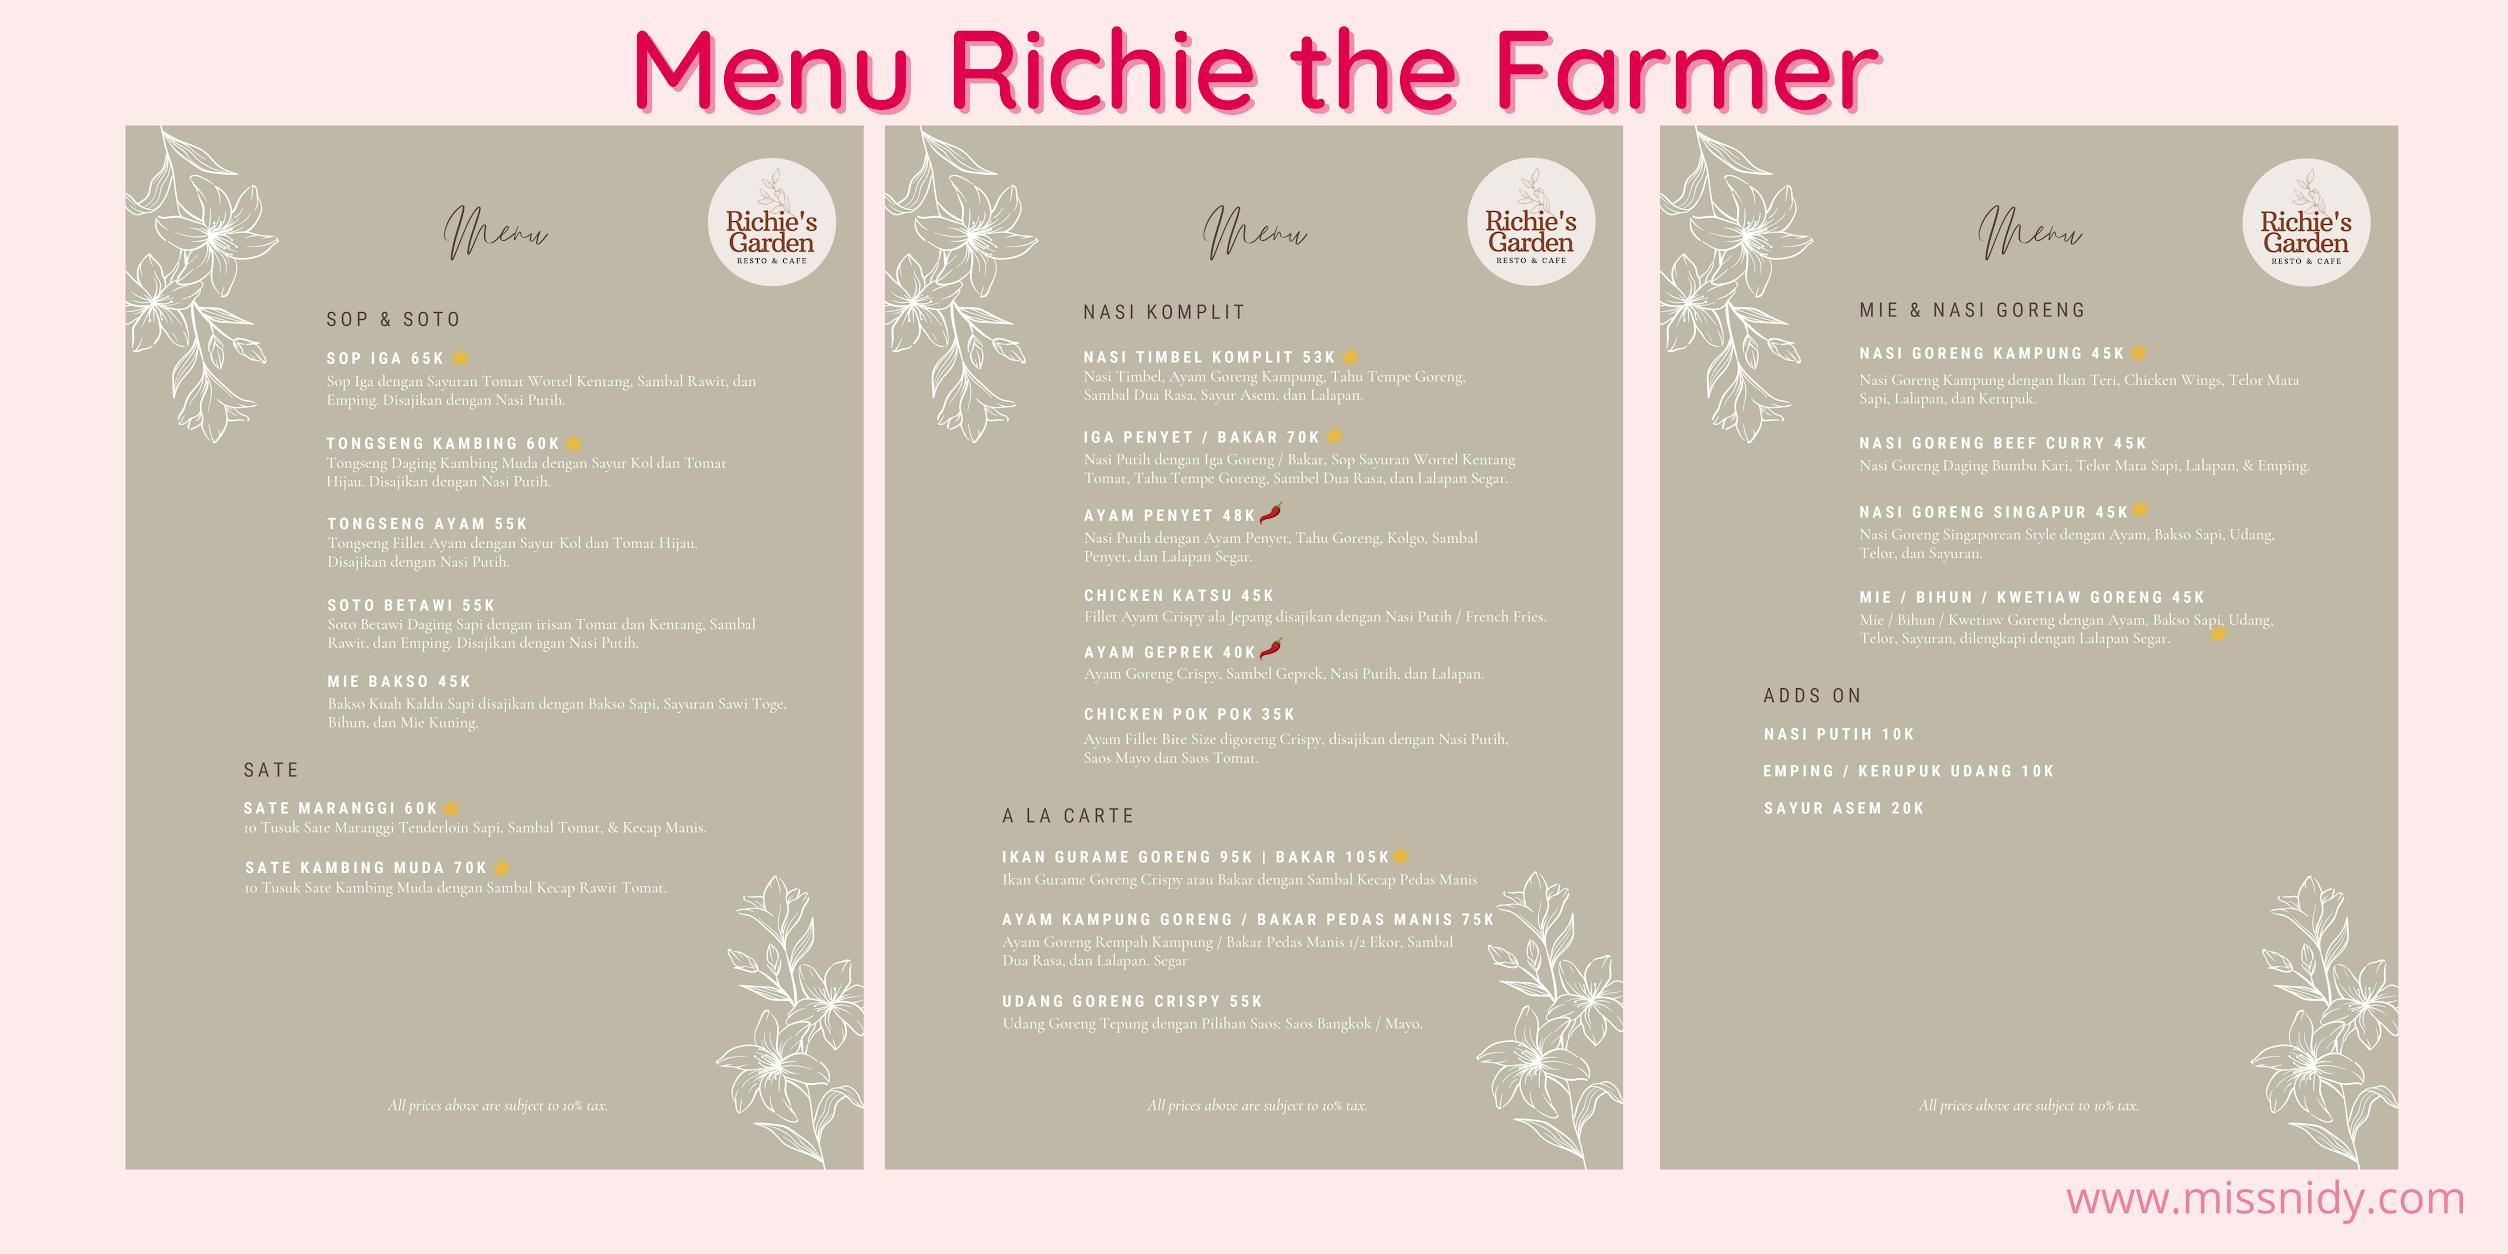 harga menu richie the farmer